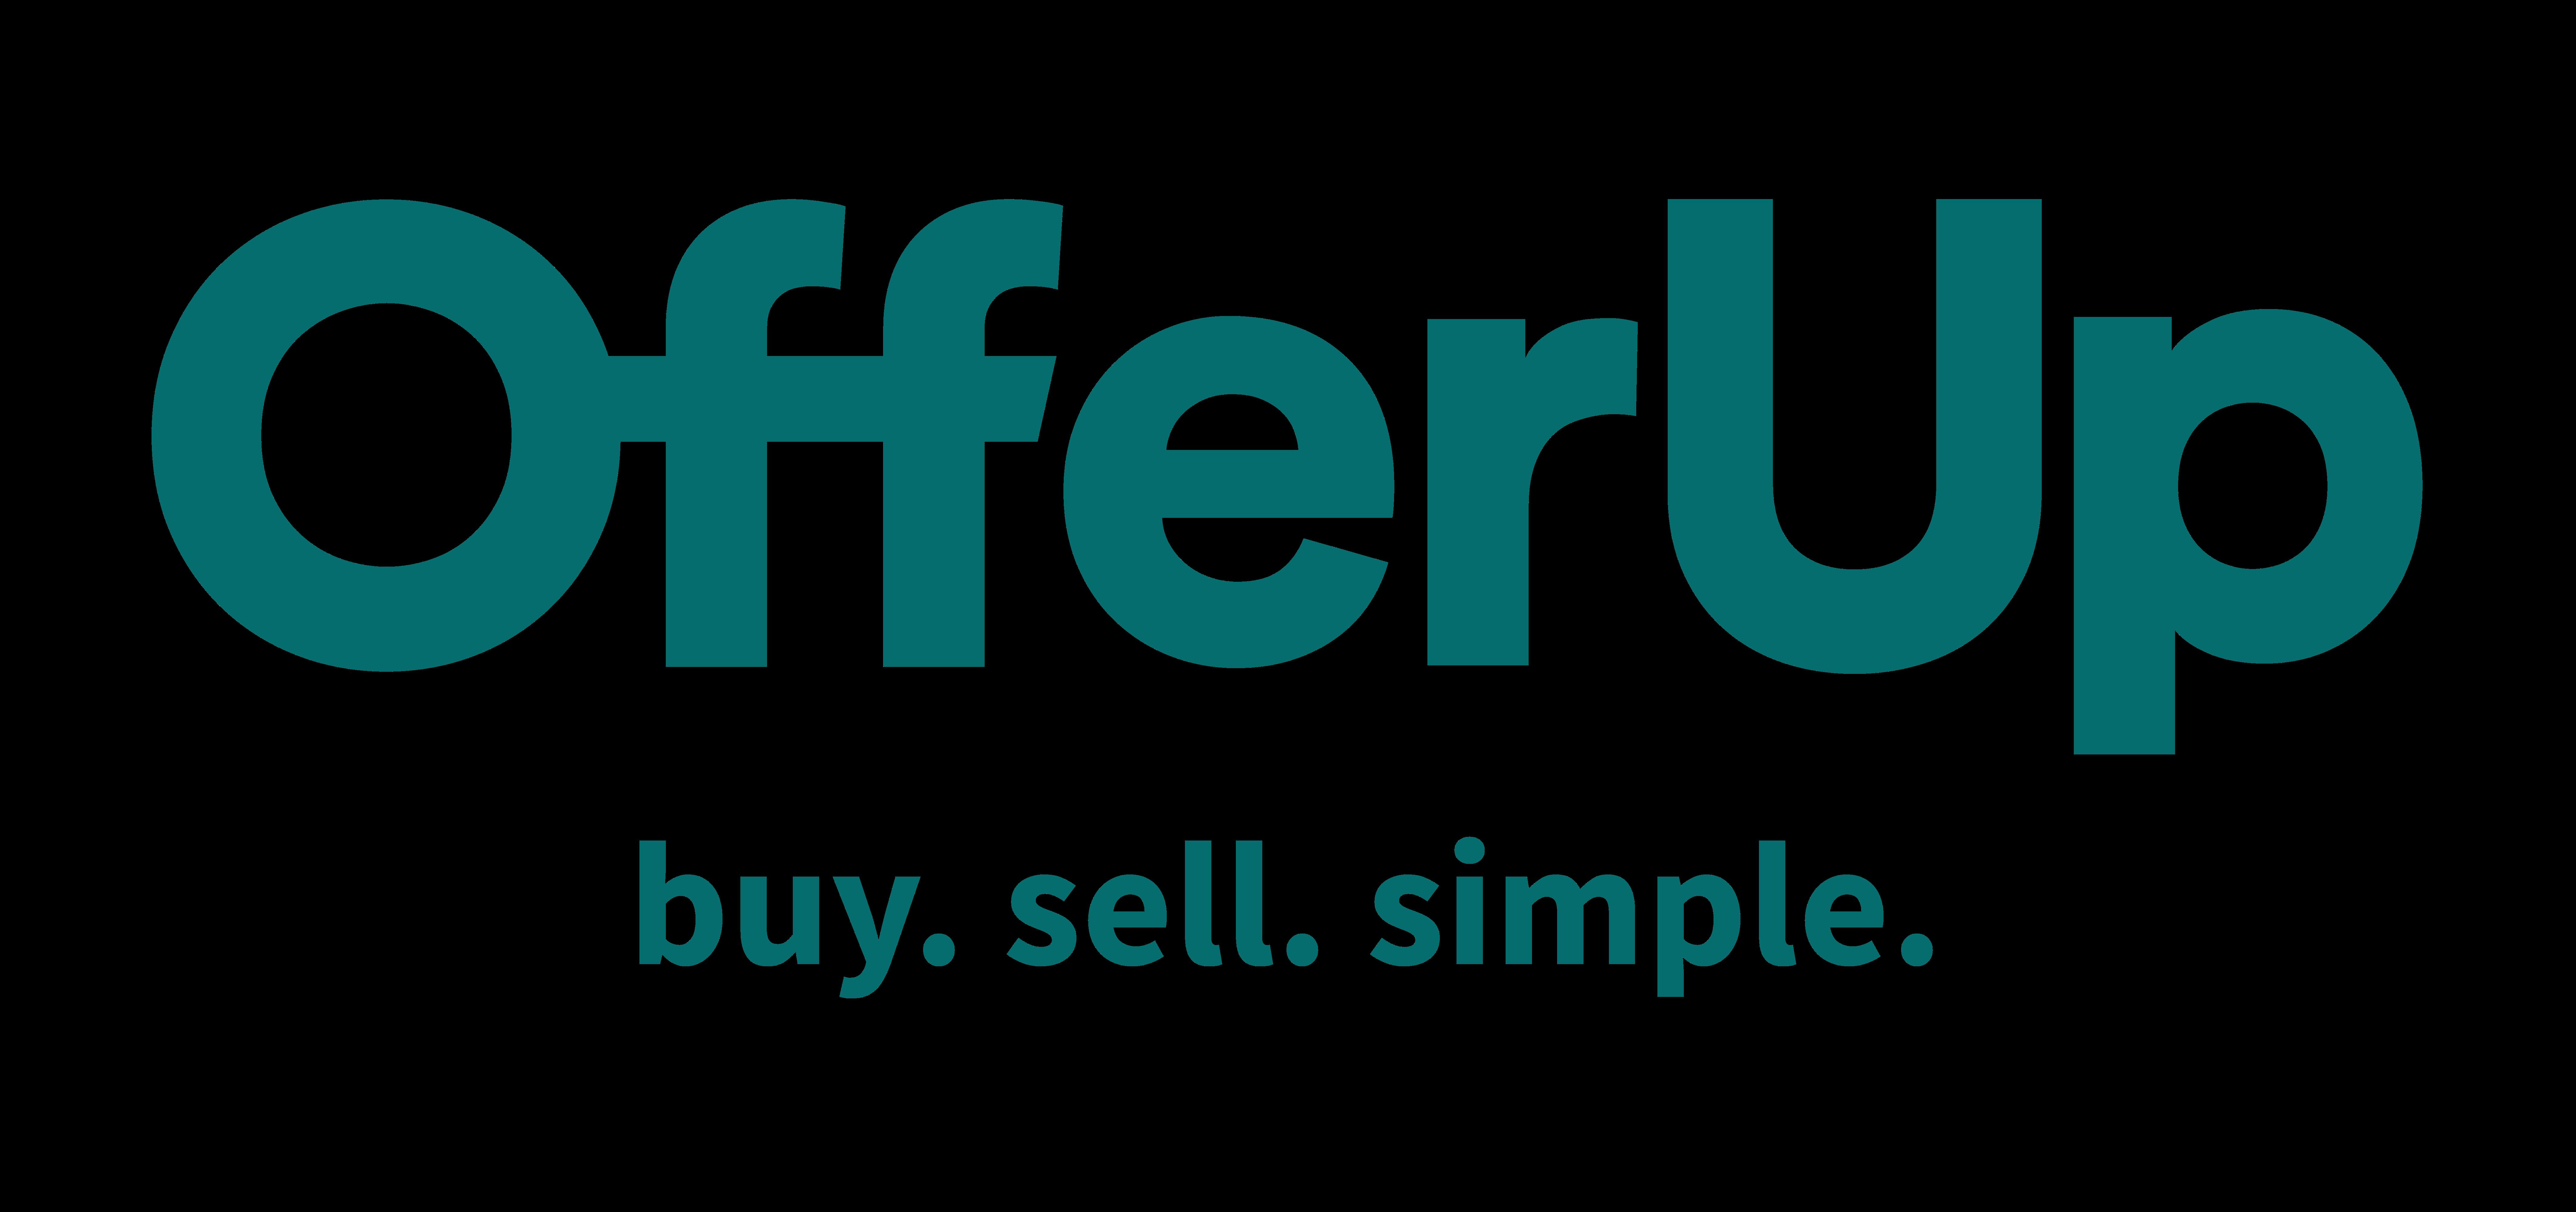 OfferUp - Wikipedia